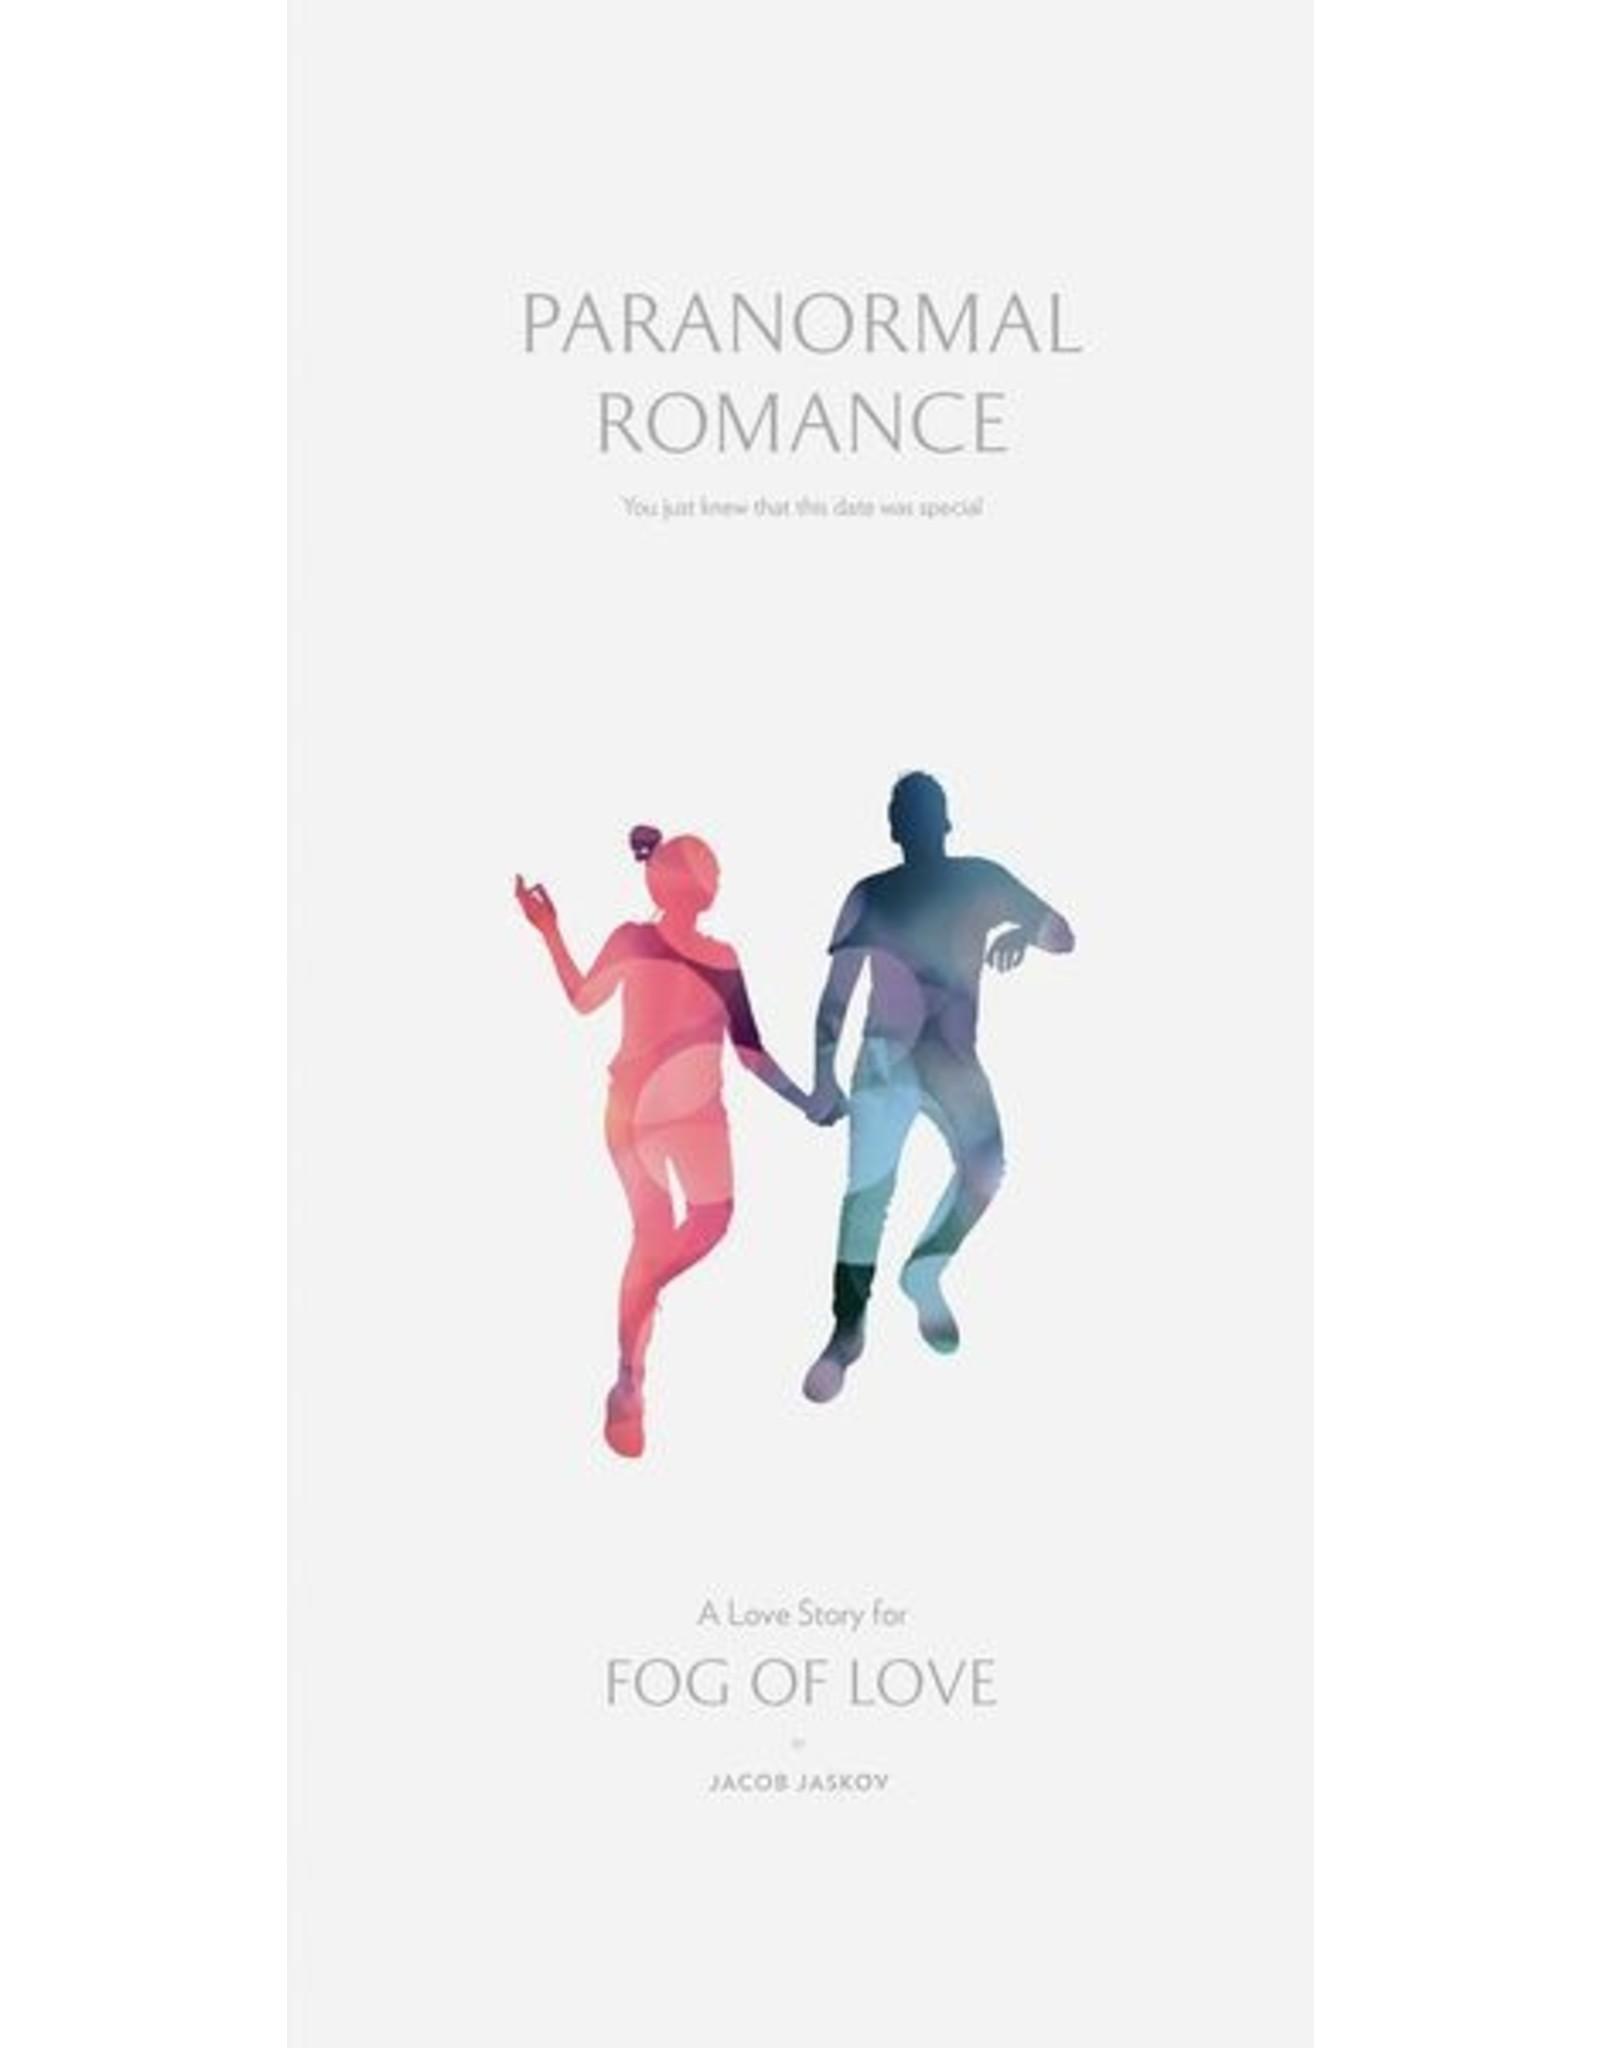 Hush Hush Productions Fog of Love: Paranormal Romance